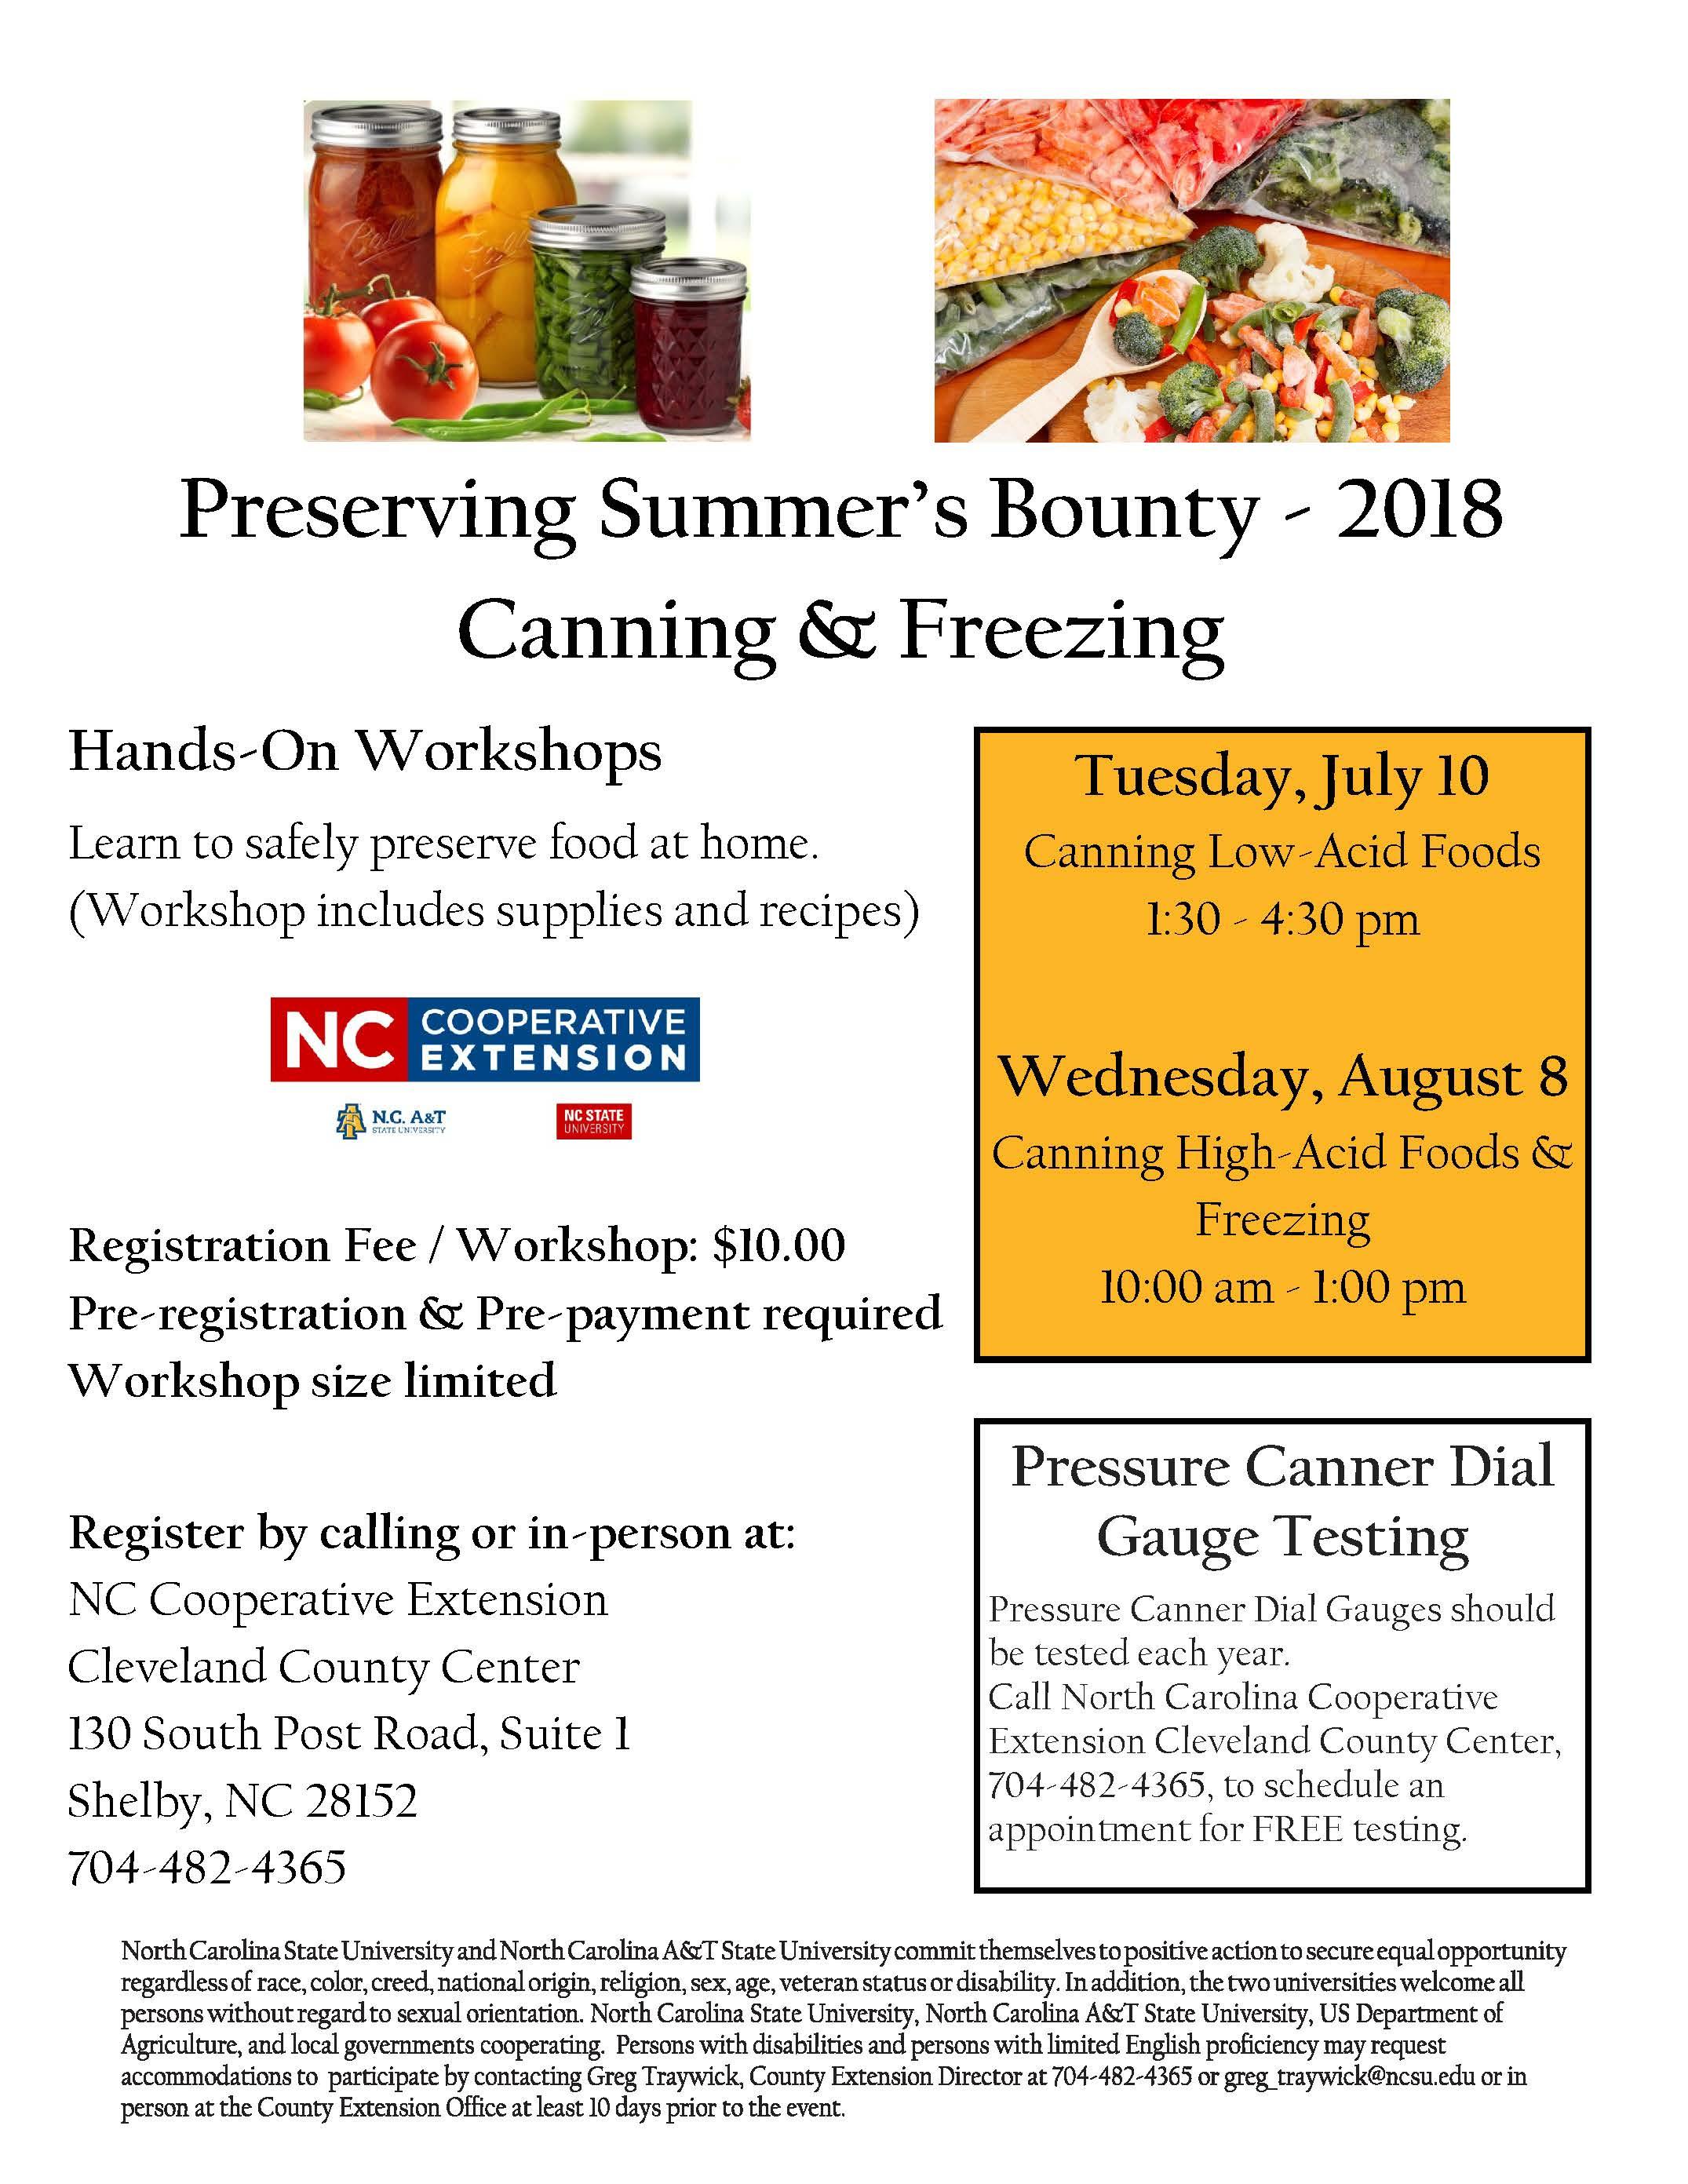 Preserving summers bounty hands on food preservation classes hands on workshops flyer image forumfinder Choice Image